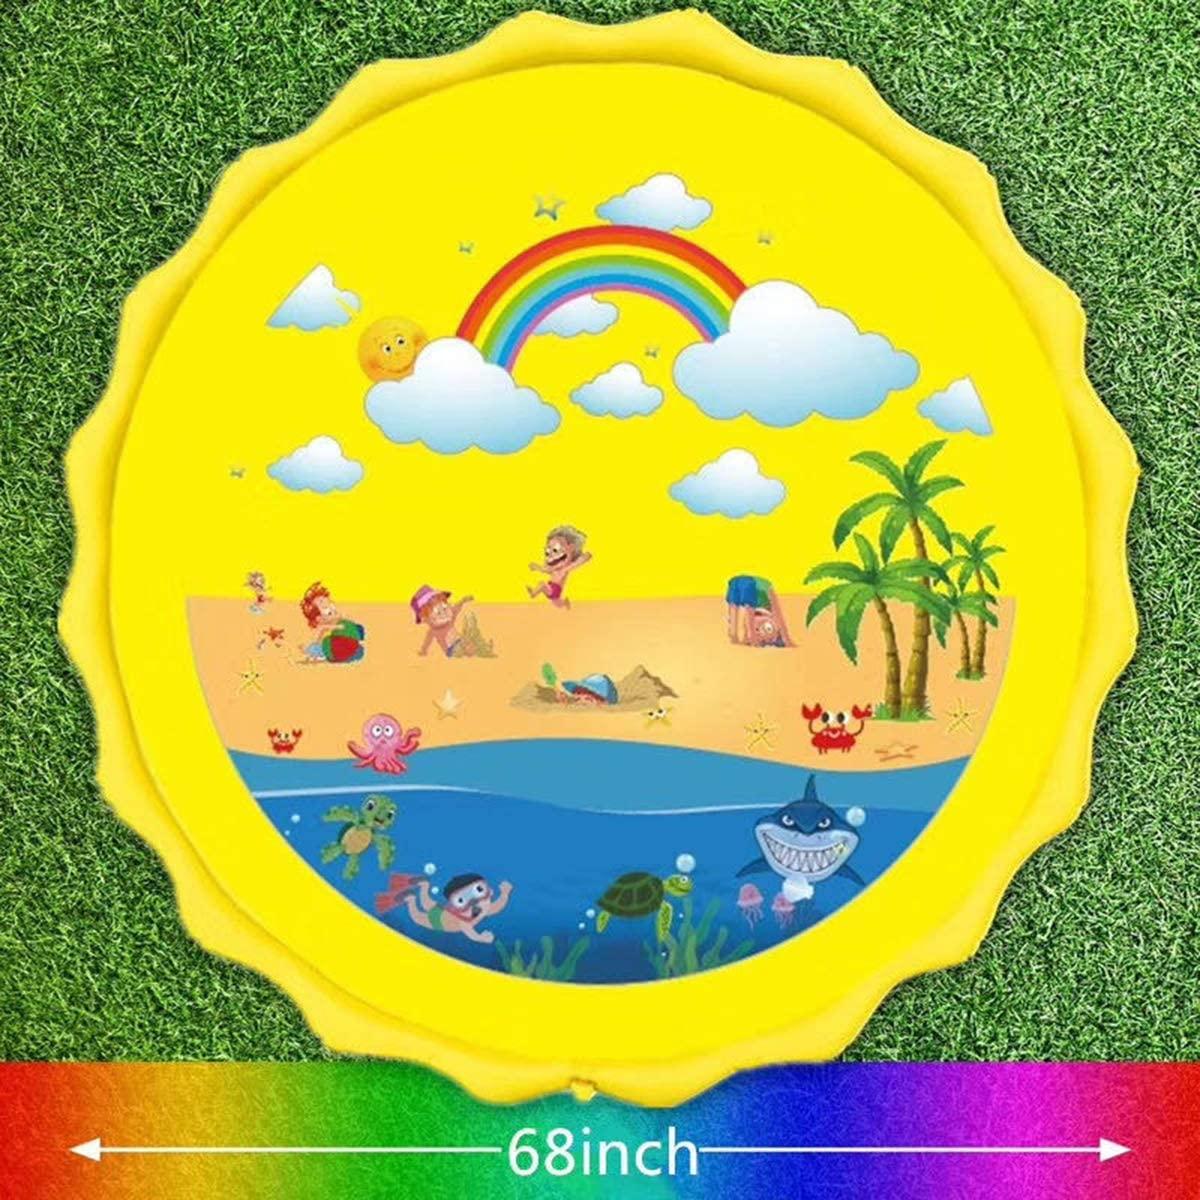 OhhGo Kids Toddler Cartoon Pattern Inflatable Sprinkler Water Play Mat Outdoor Children Fun Water Play Pad